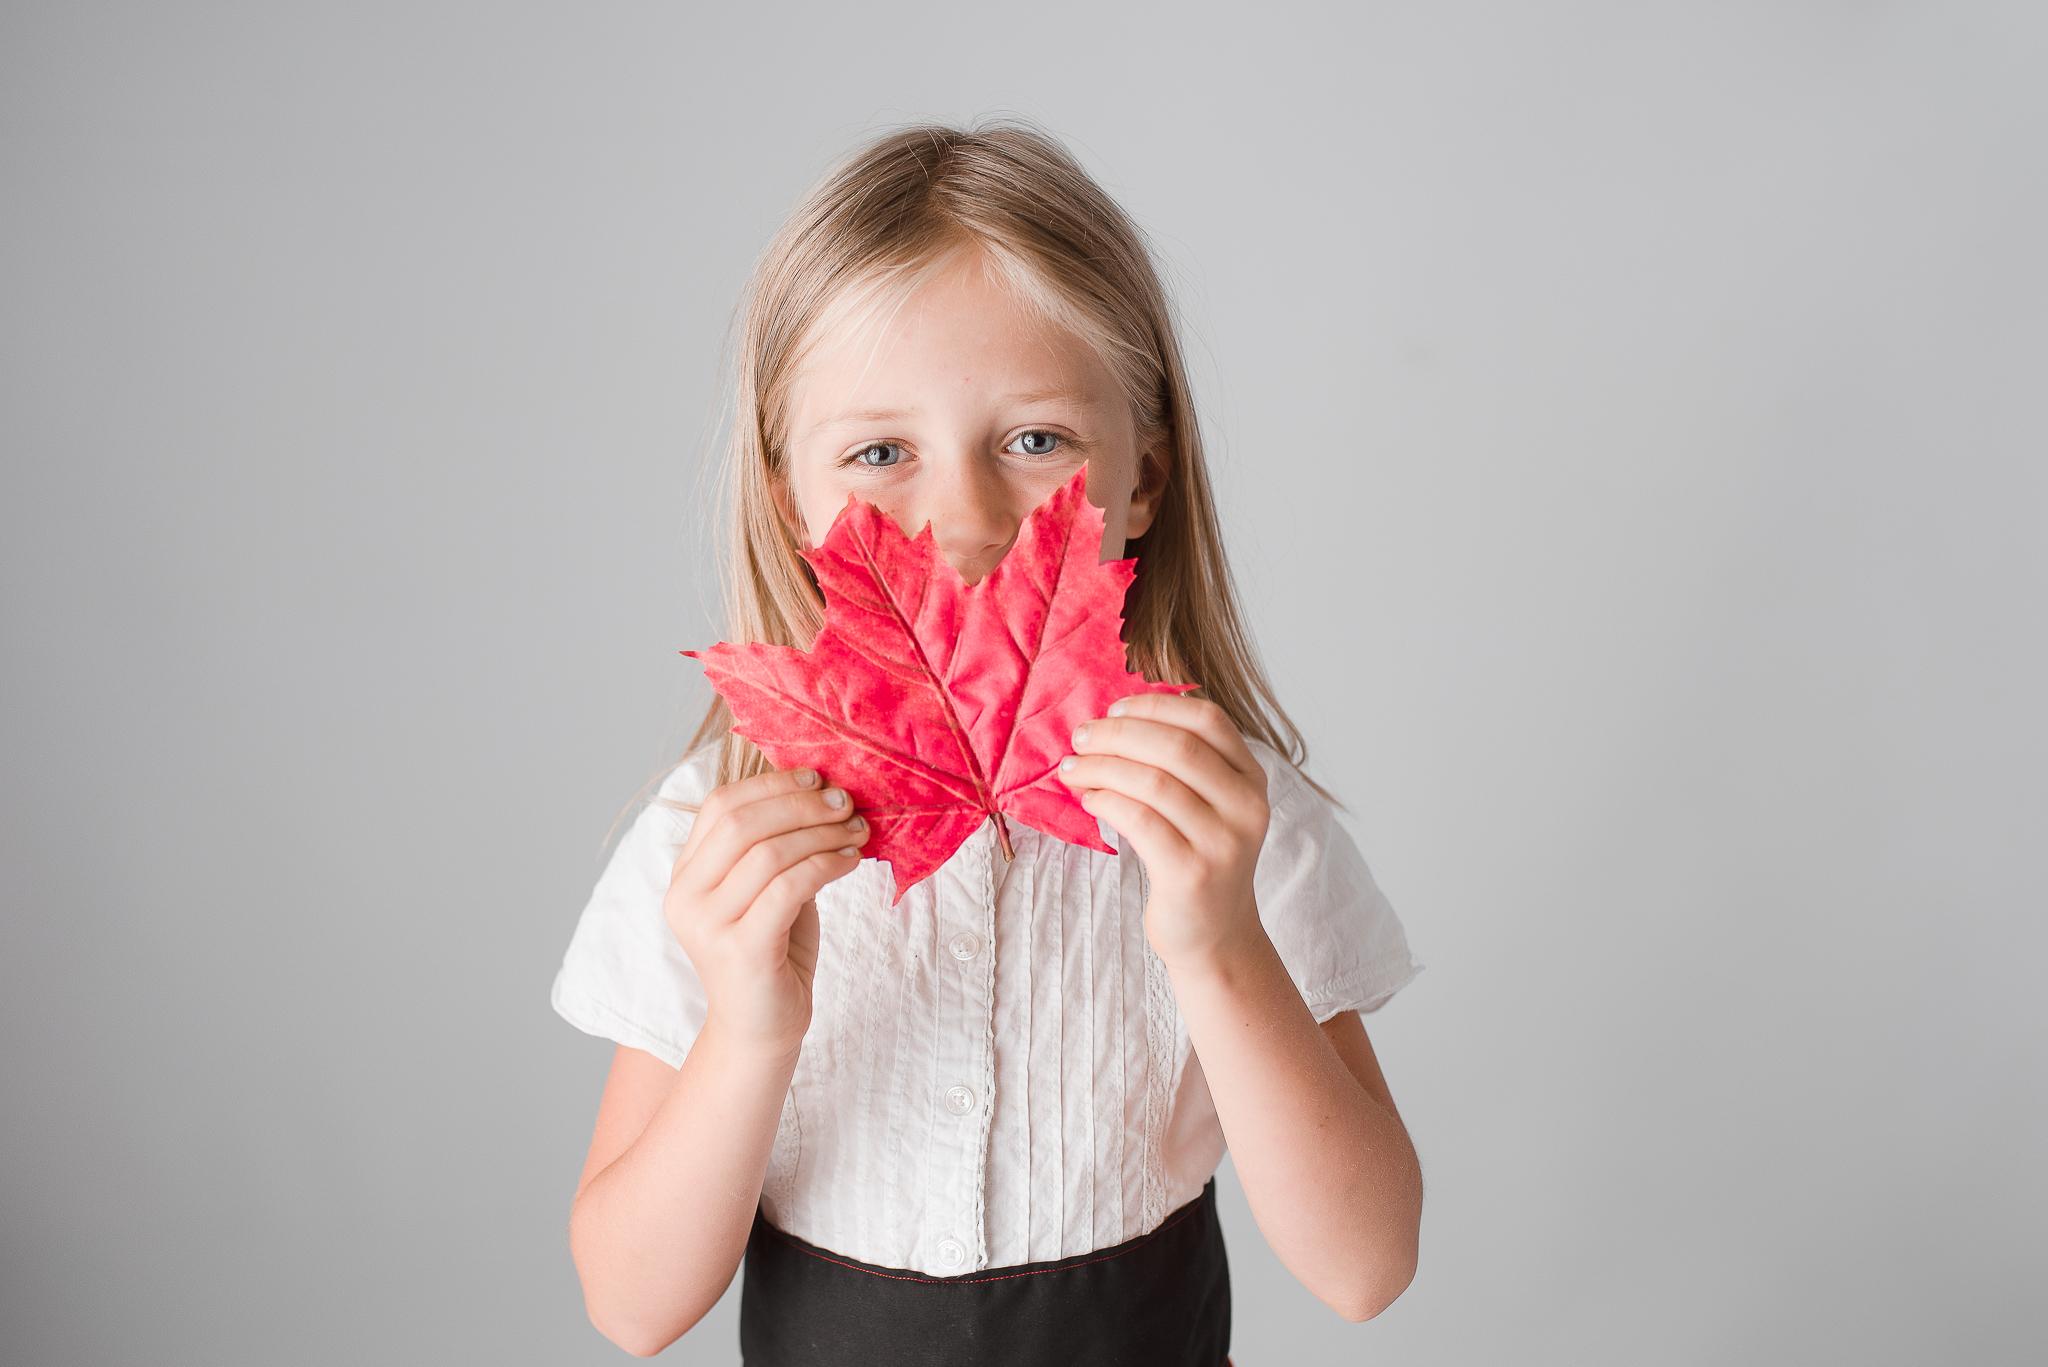 Naomi Lucienne Peterborough Photography Portrait Photography Children Photography Family Photography-7.jpg